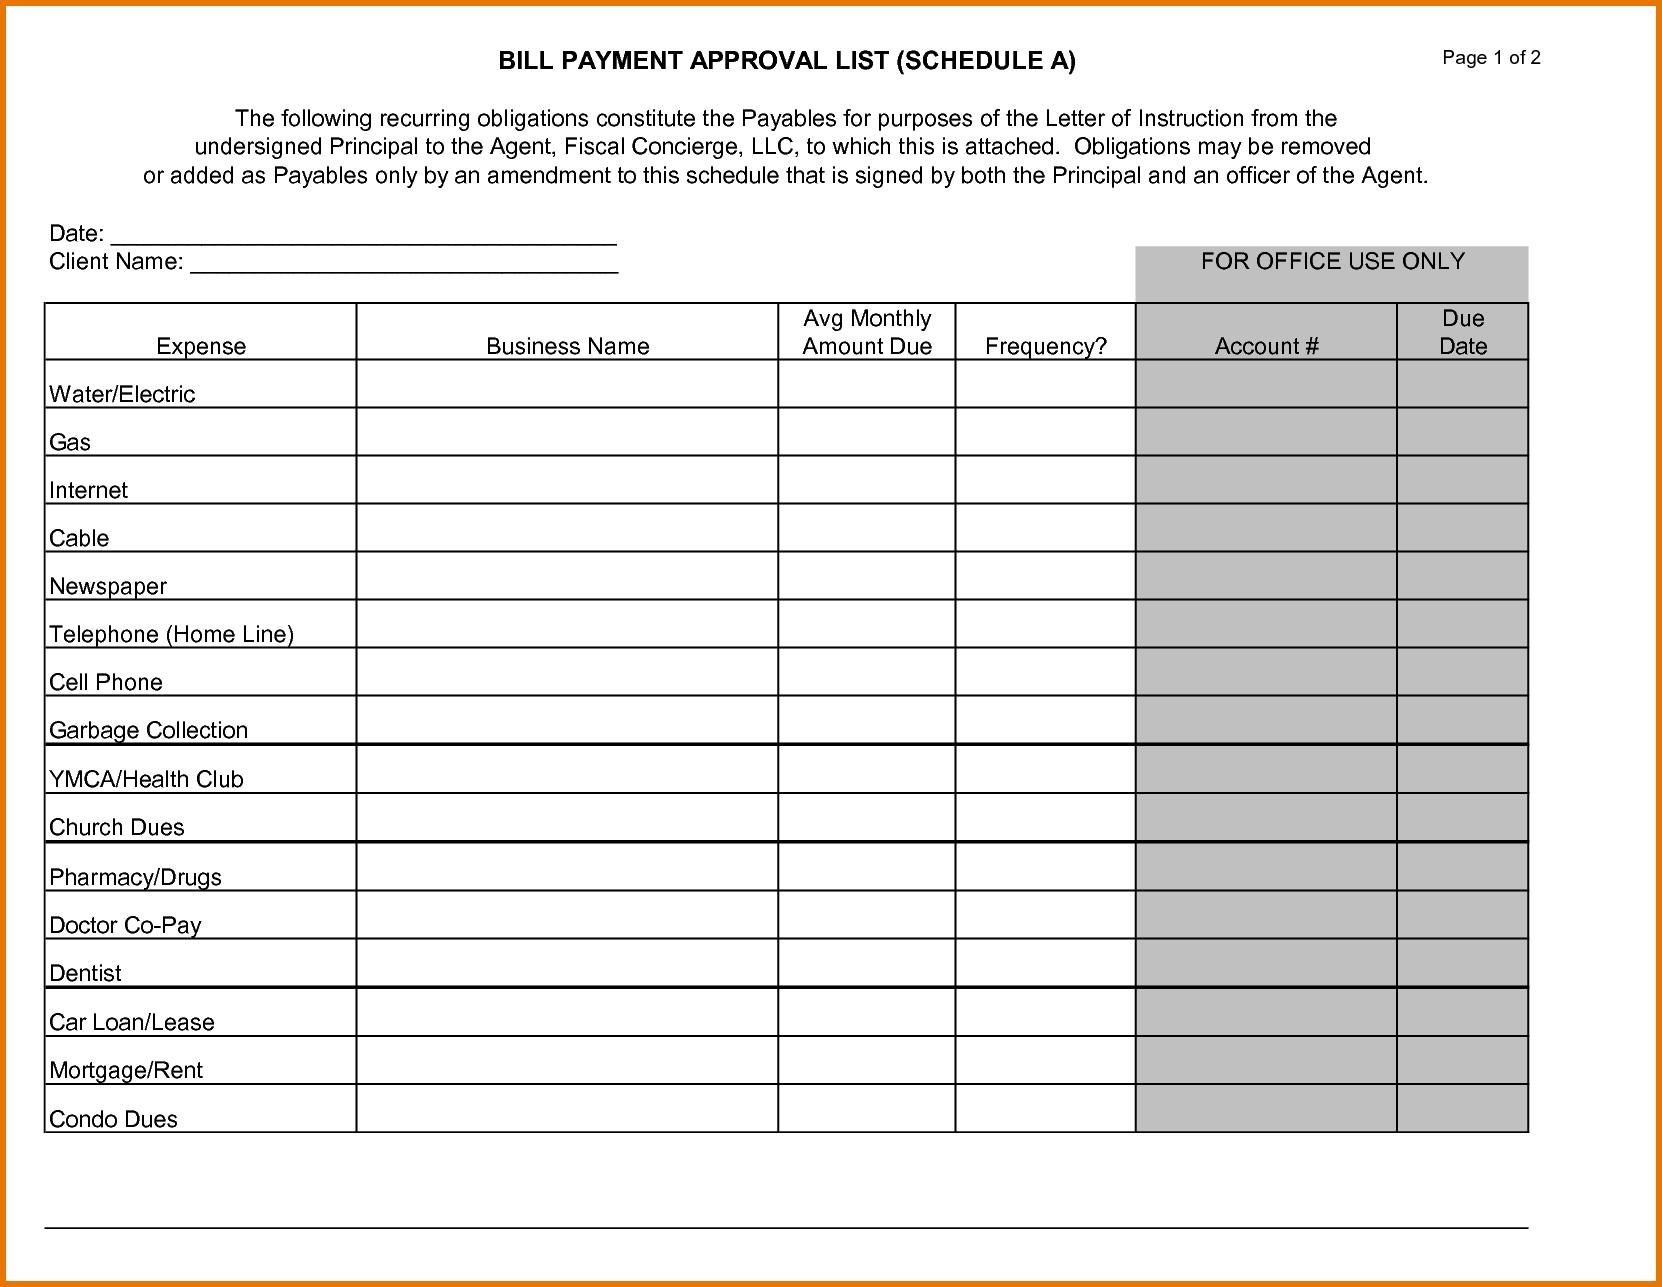 Bill Payment Calendar Template Fitted Photo Schedule For Bill within Bill Due Date Calendar Template